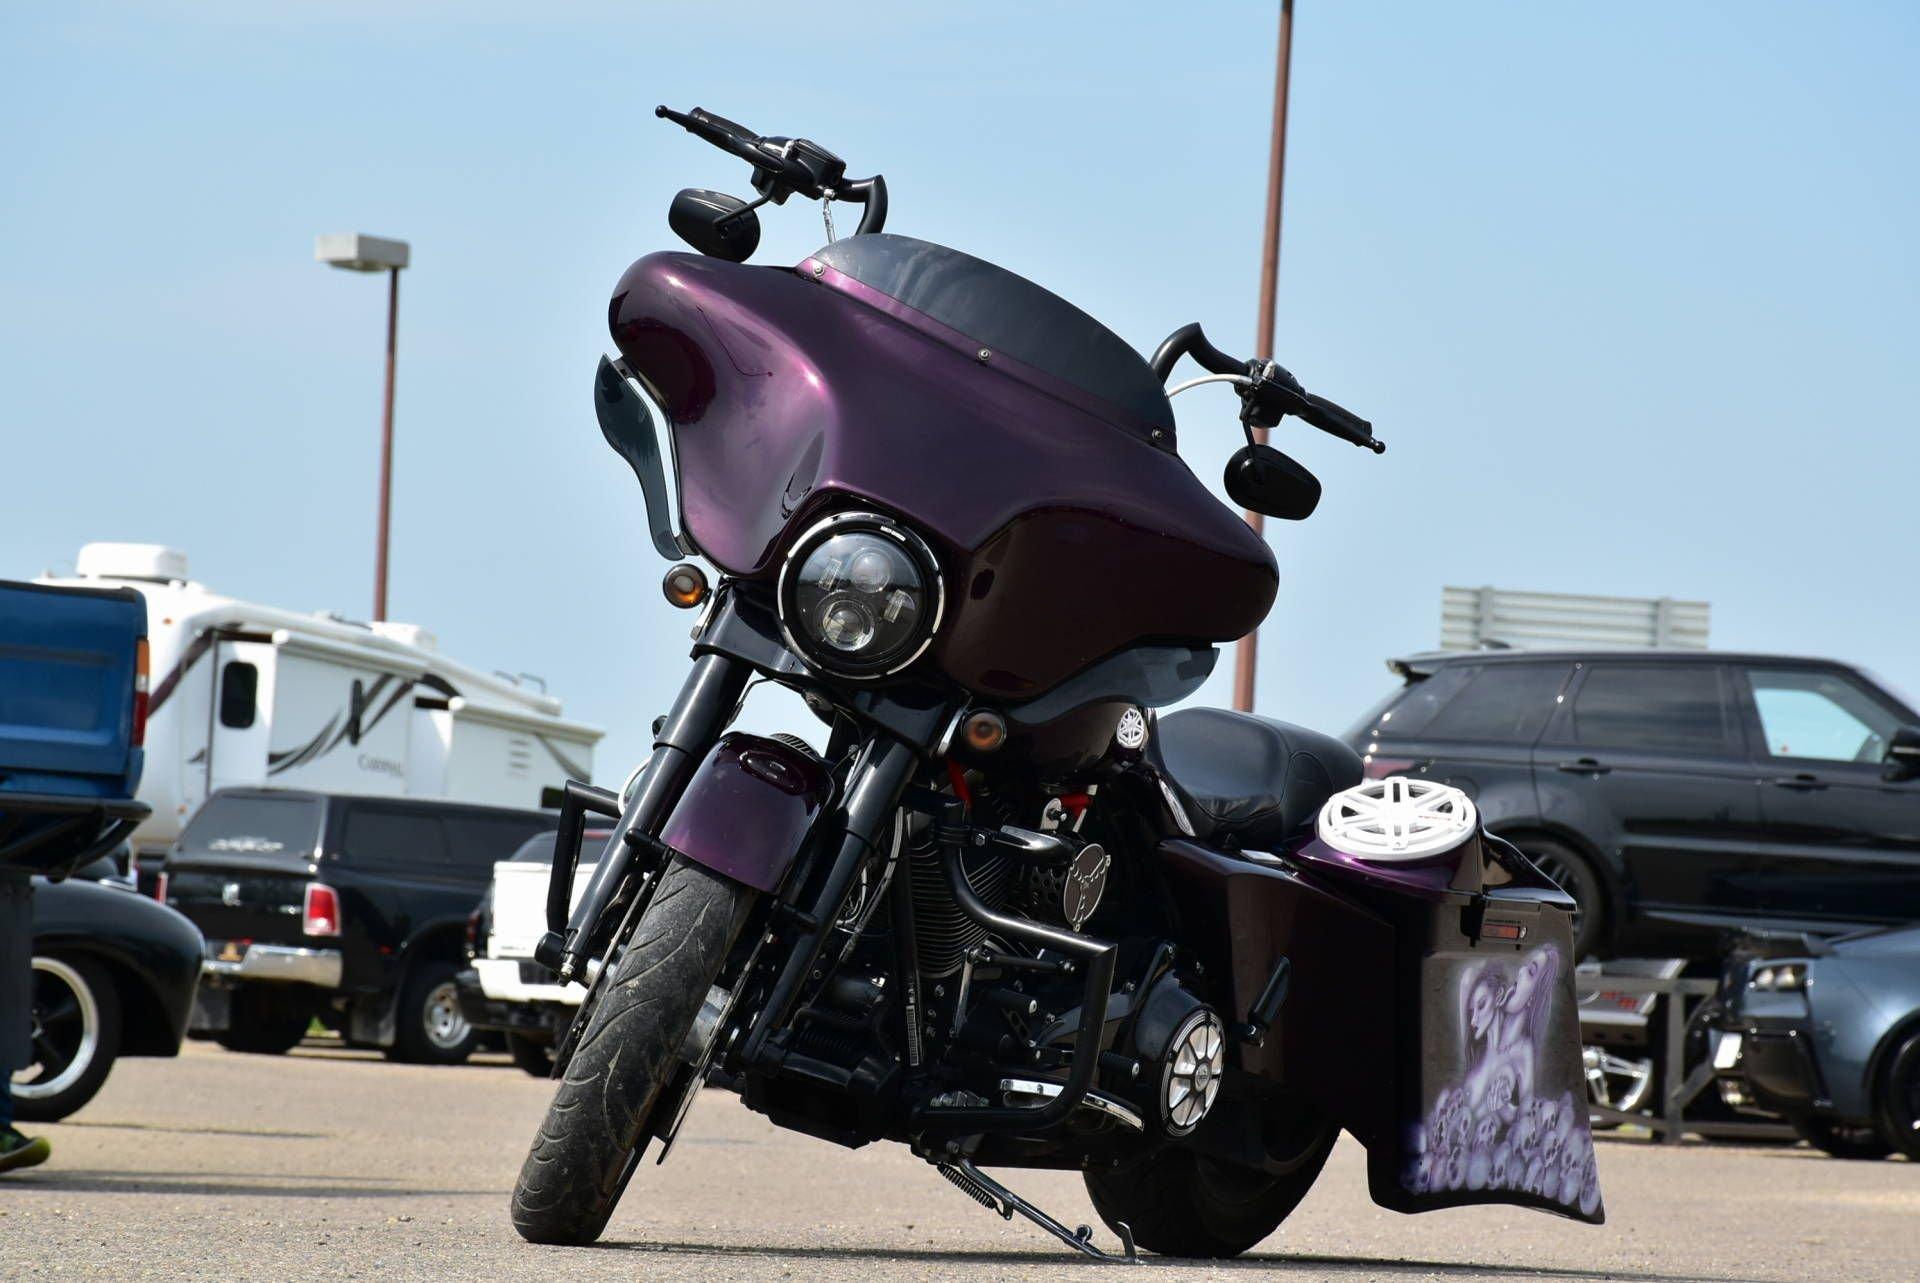 2013 harley davidson street glide bagger custom